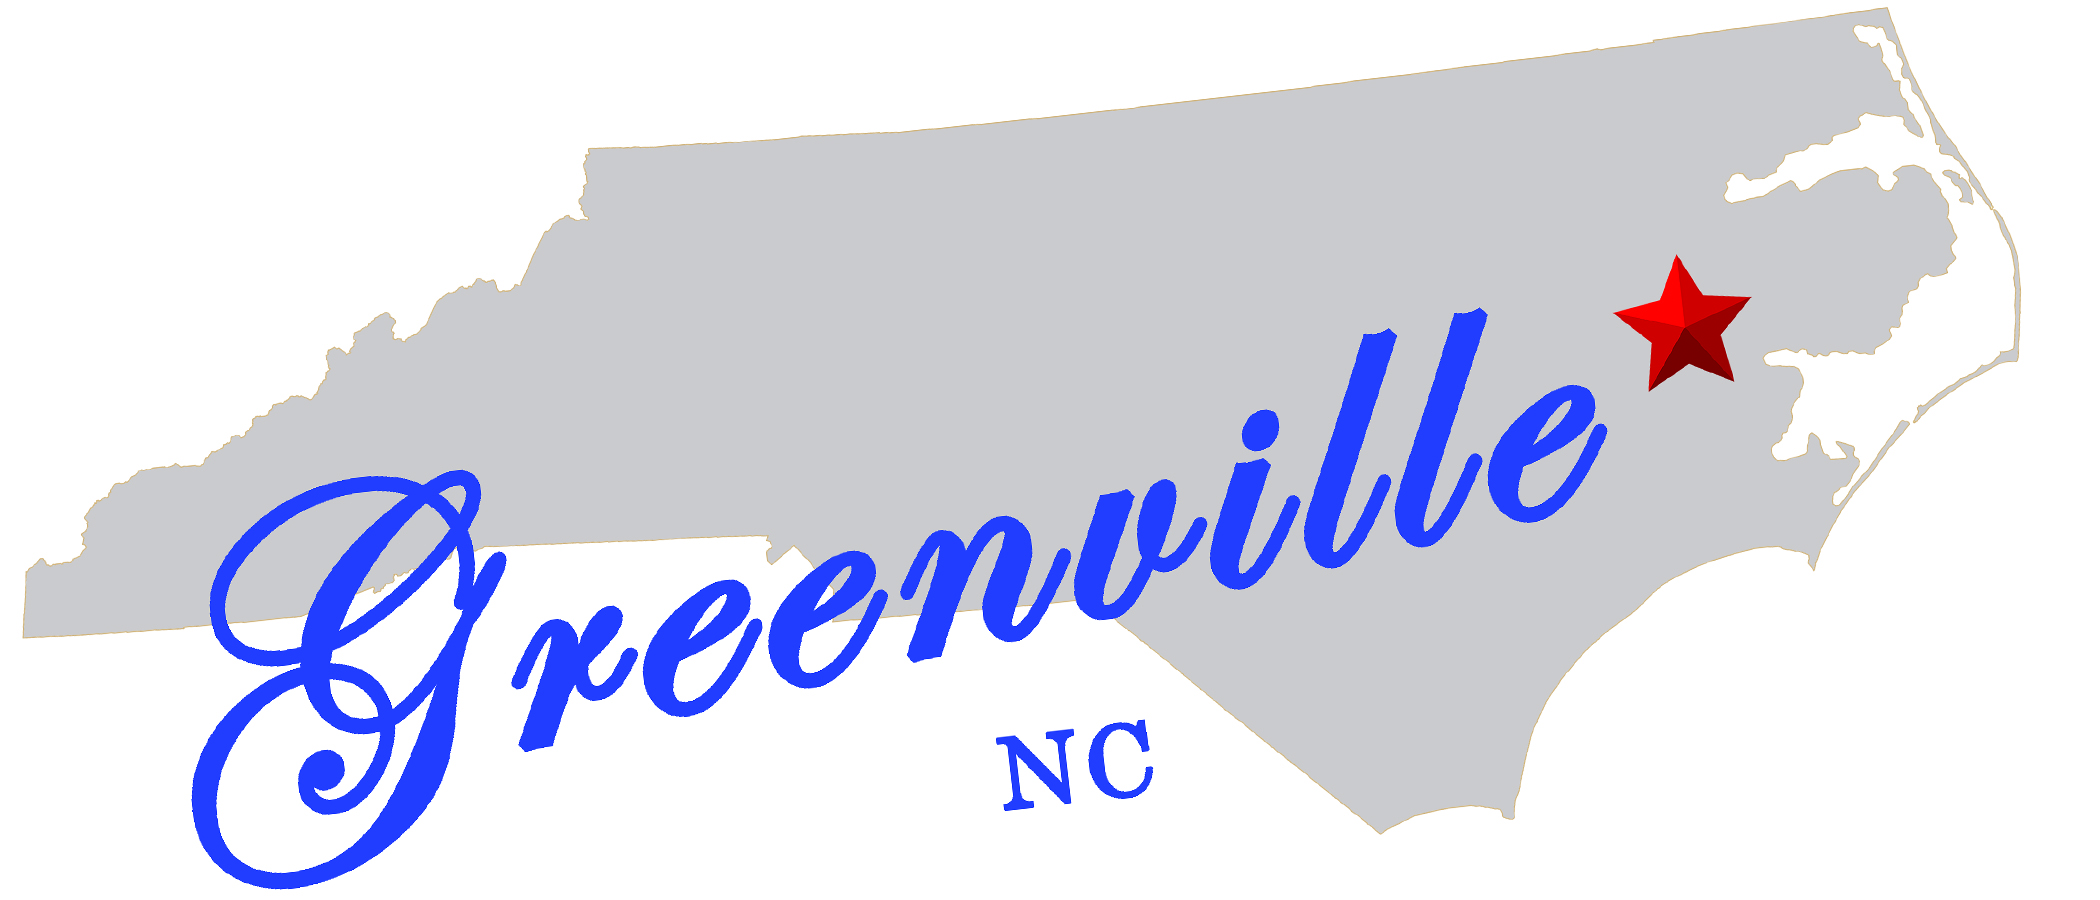 Greenville NC.jpg